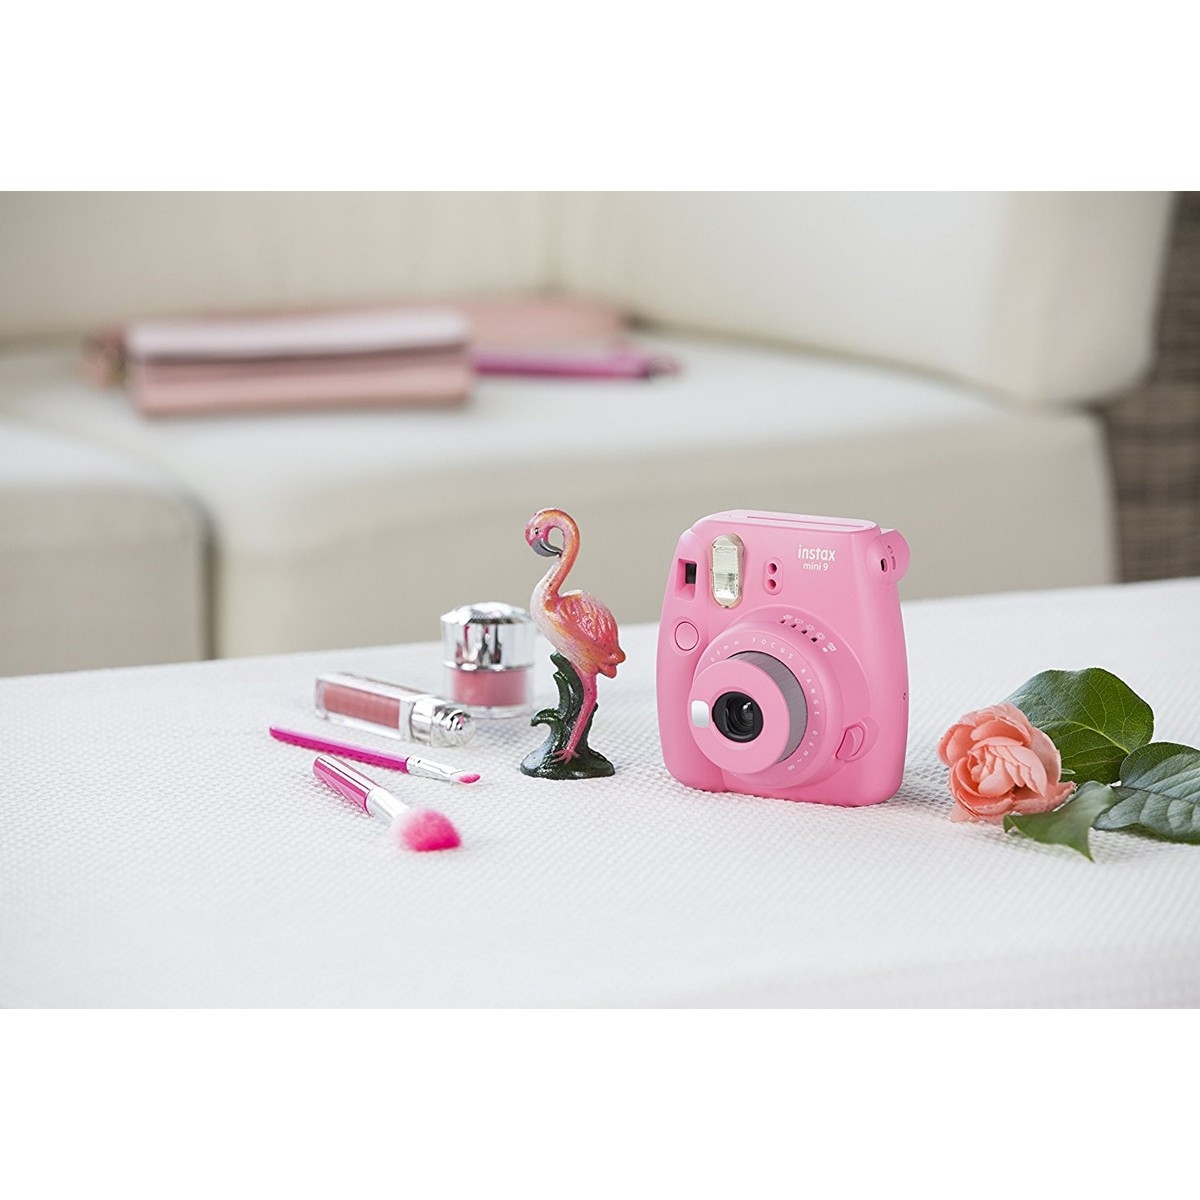 Fujifilm Instax Mini 9 Camera 10 Shots Free Flamingo